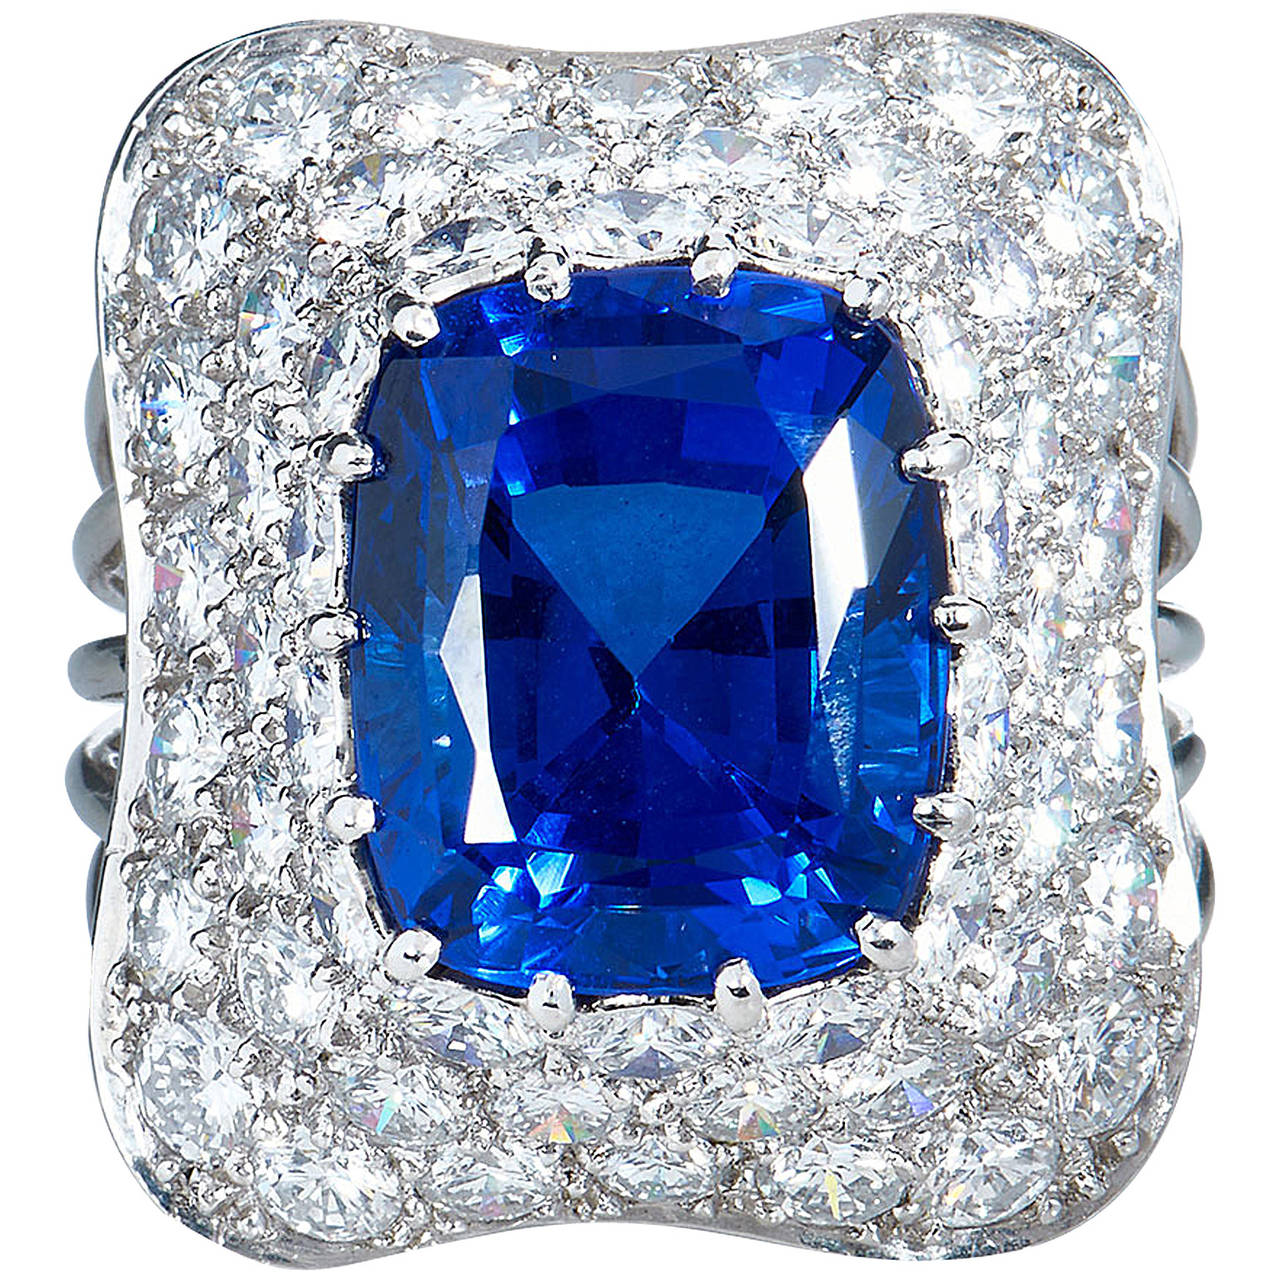 10.18 carat Cushion Cut Tanzanite Diamond Pave Platinum Ring